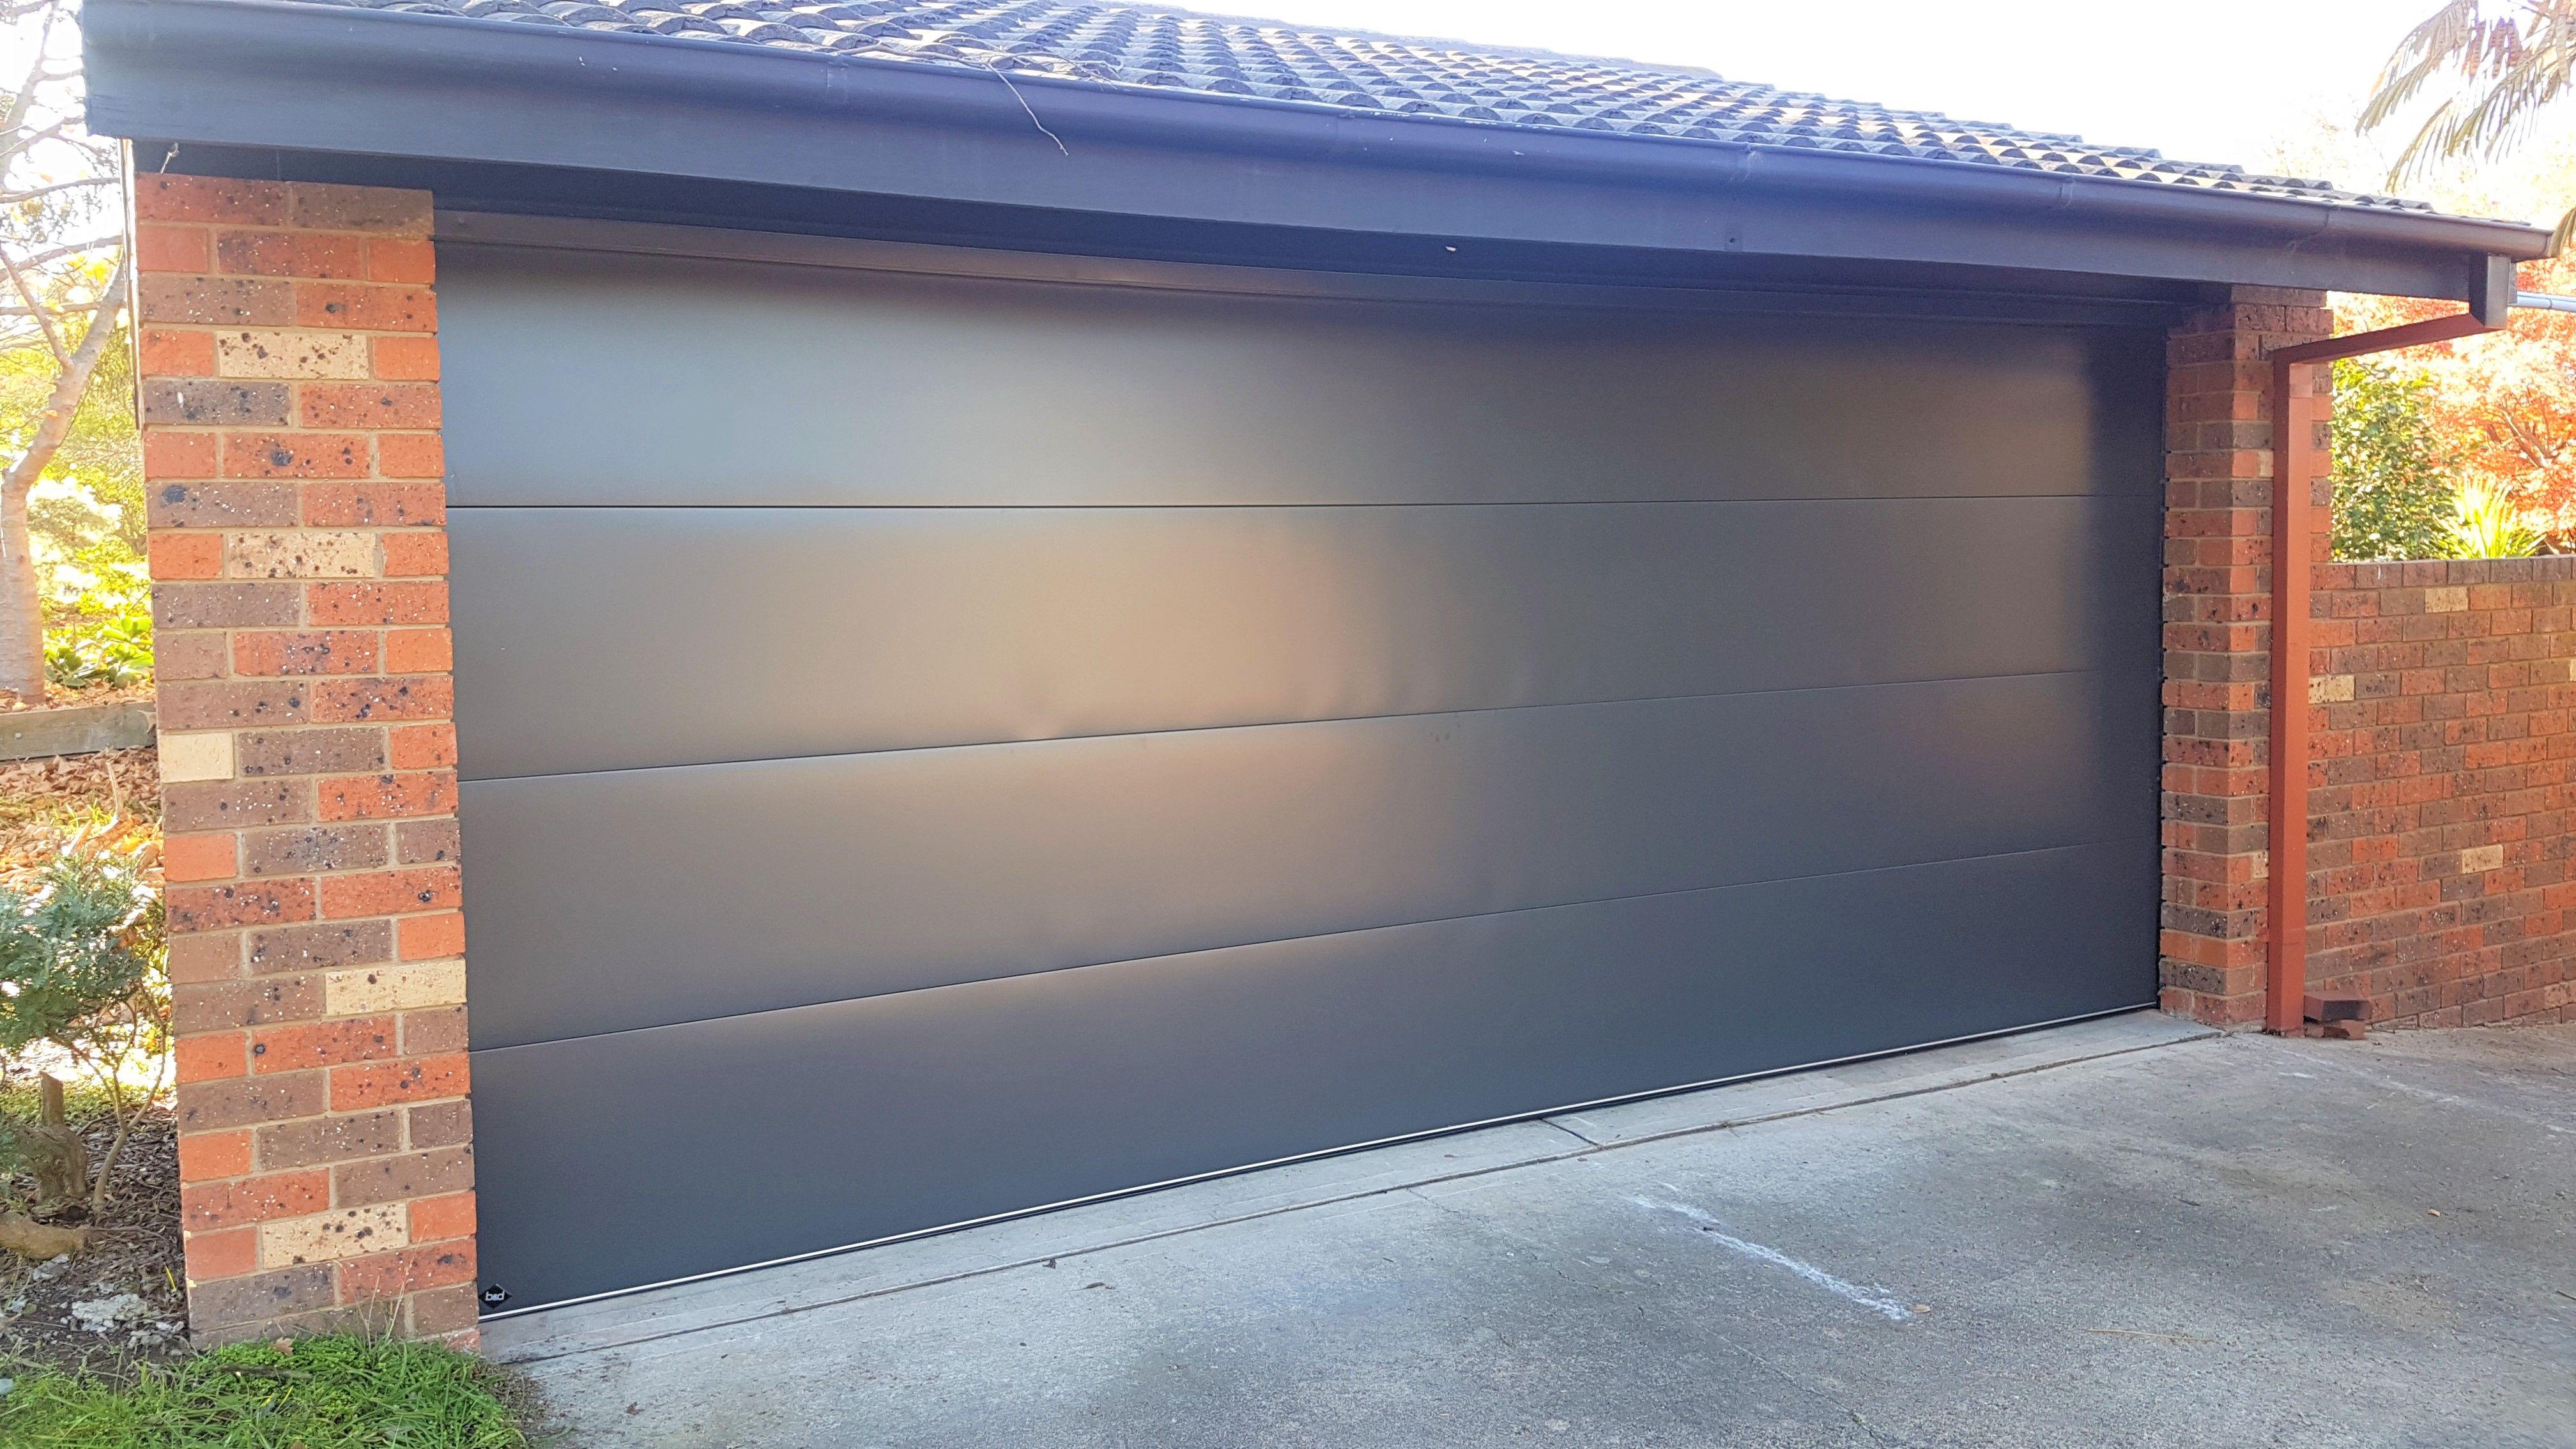 Gallery Garage Doors Canberra Fencing Canberra Garage Doors Garage Garage Bathroom